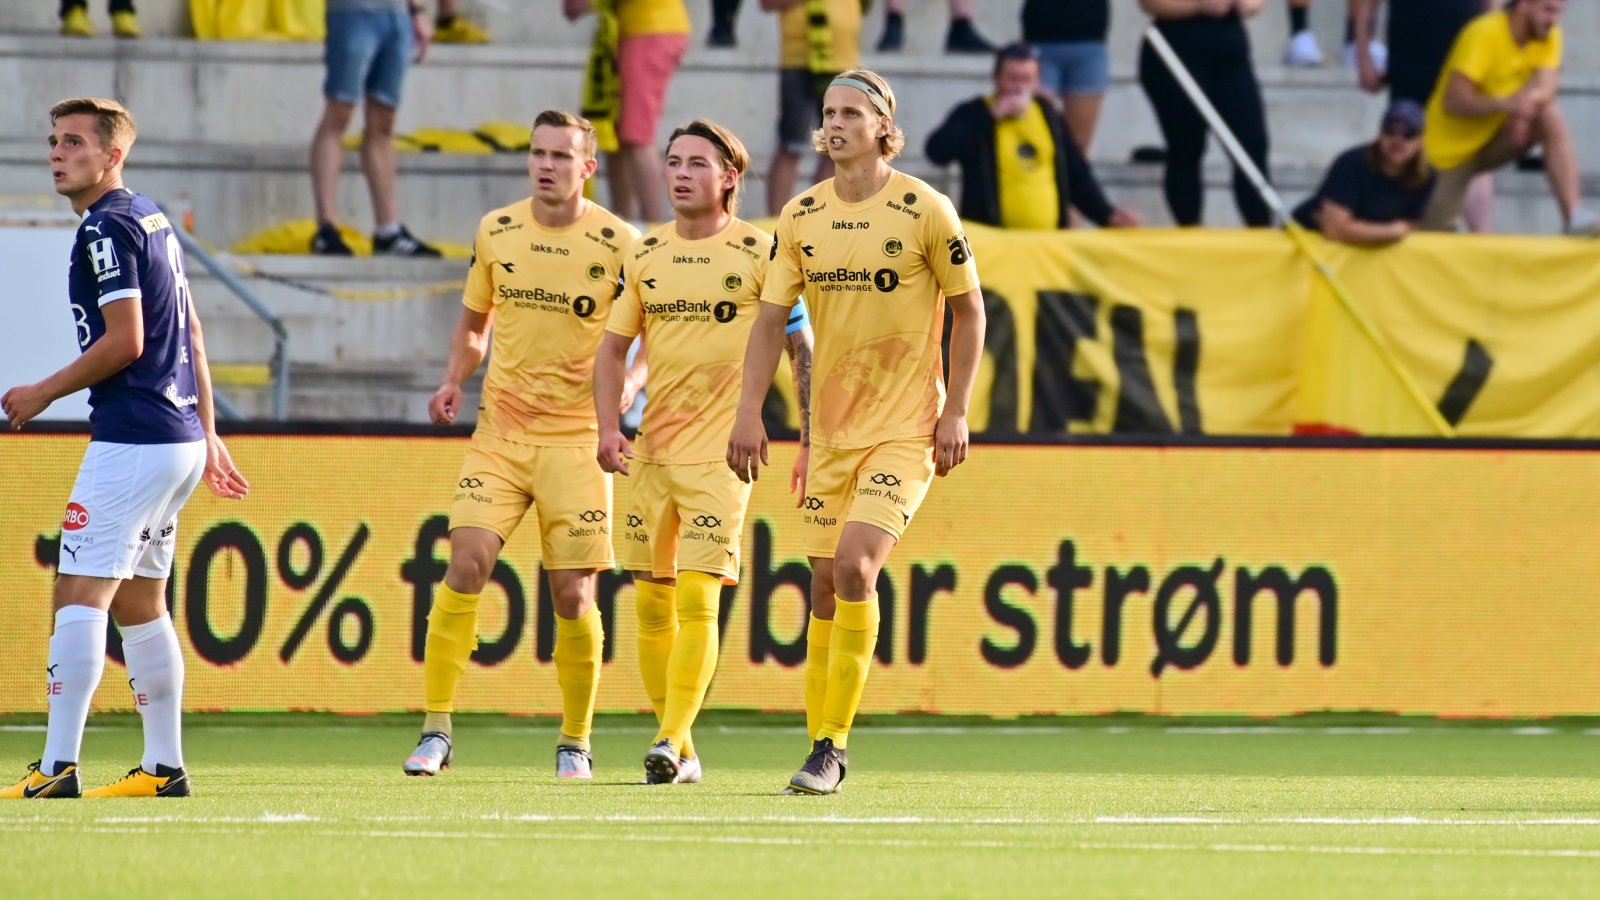 Marius Lode, Patrick Berg og Ulrik Saltnes i kampen mot Strømsgodset i 2020.